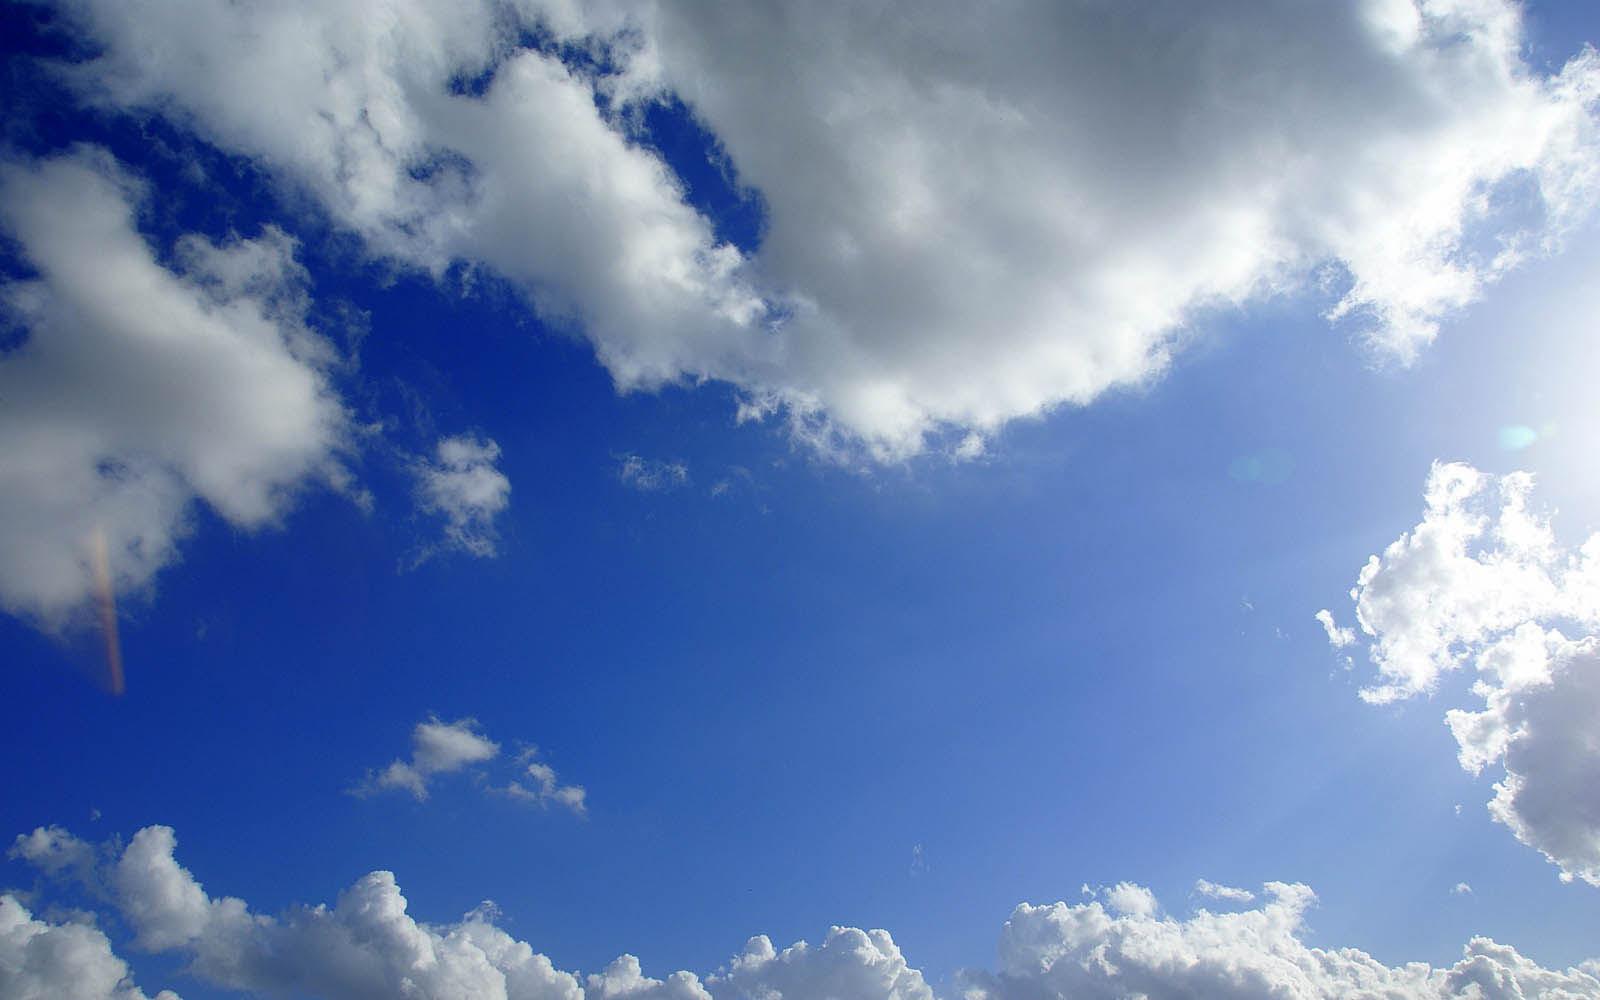 [48+] Blue Sky Background Wallpaper on WallpaperSafari